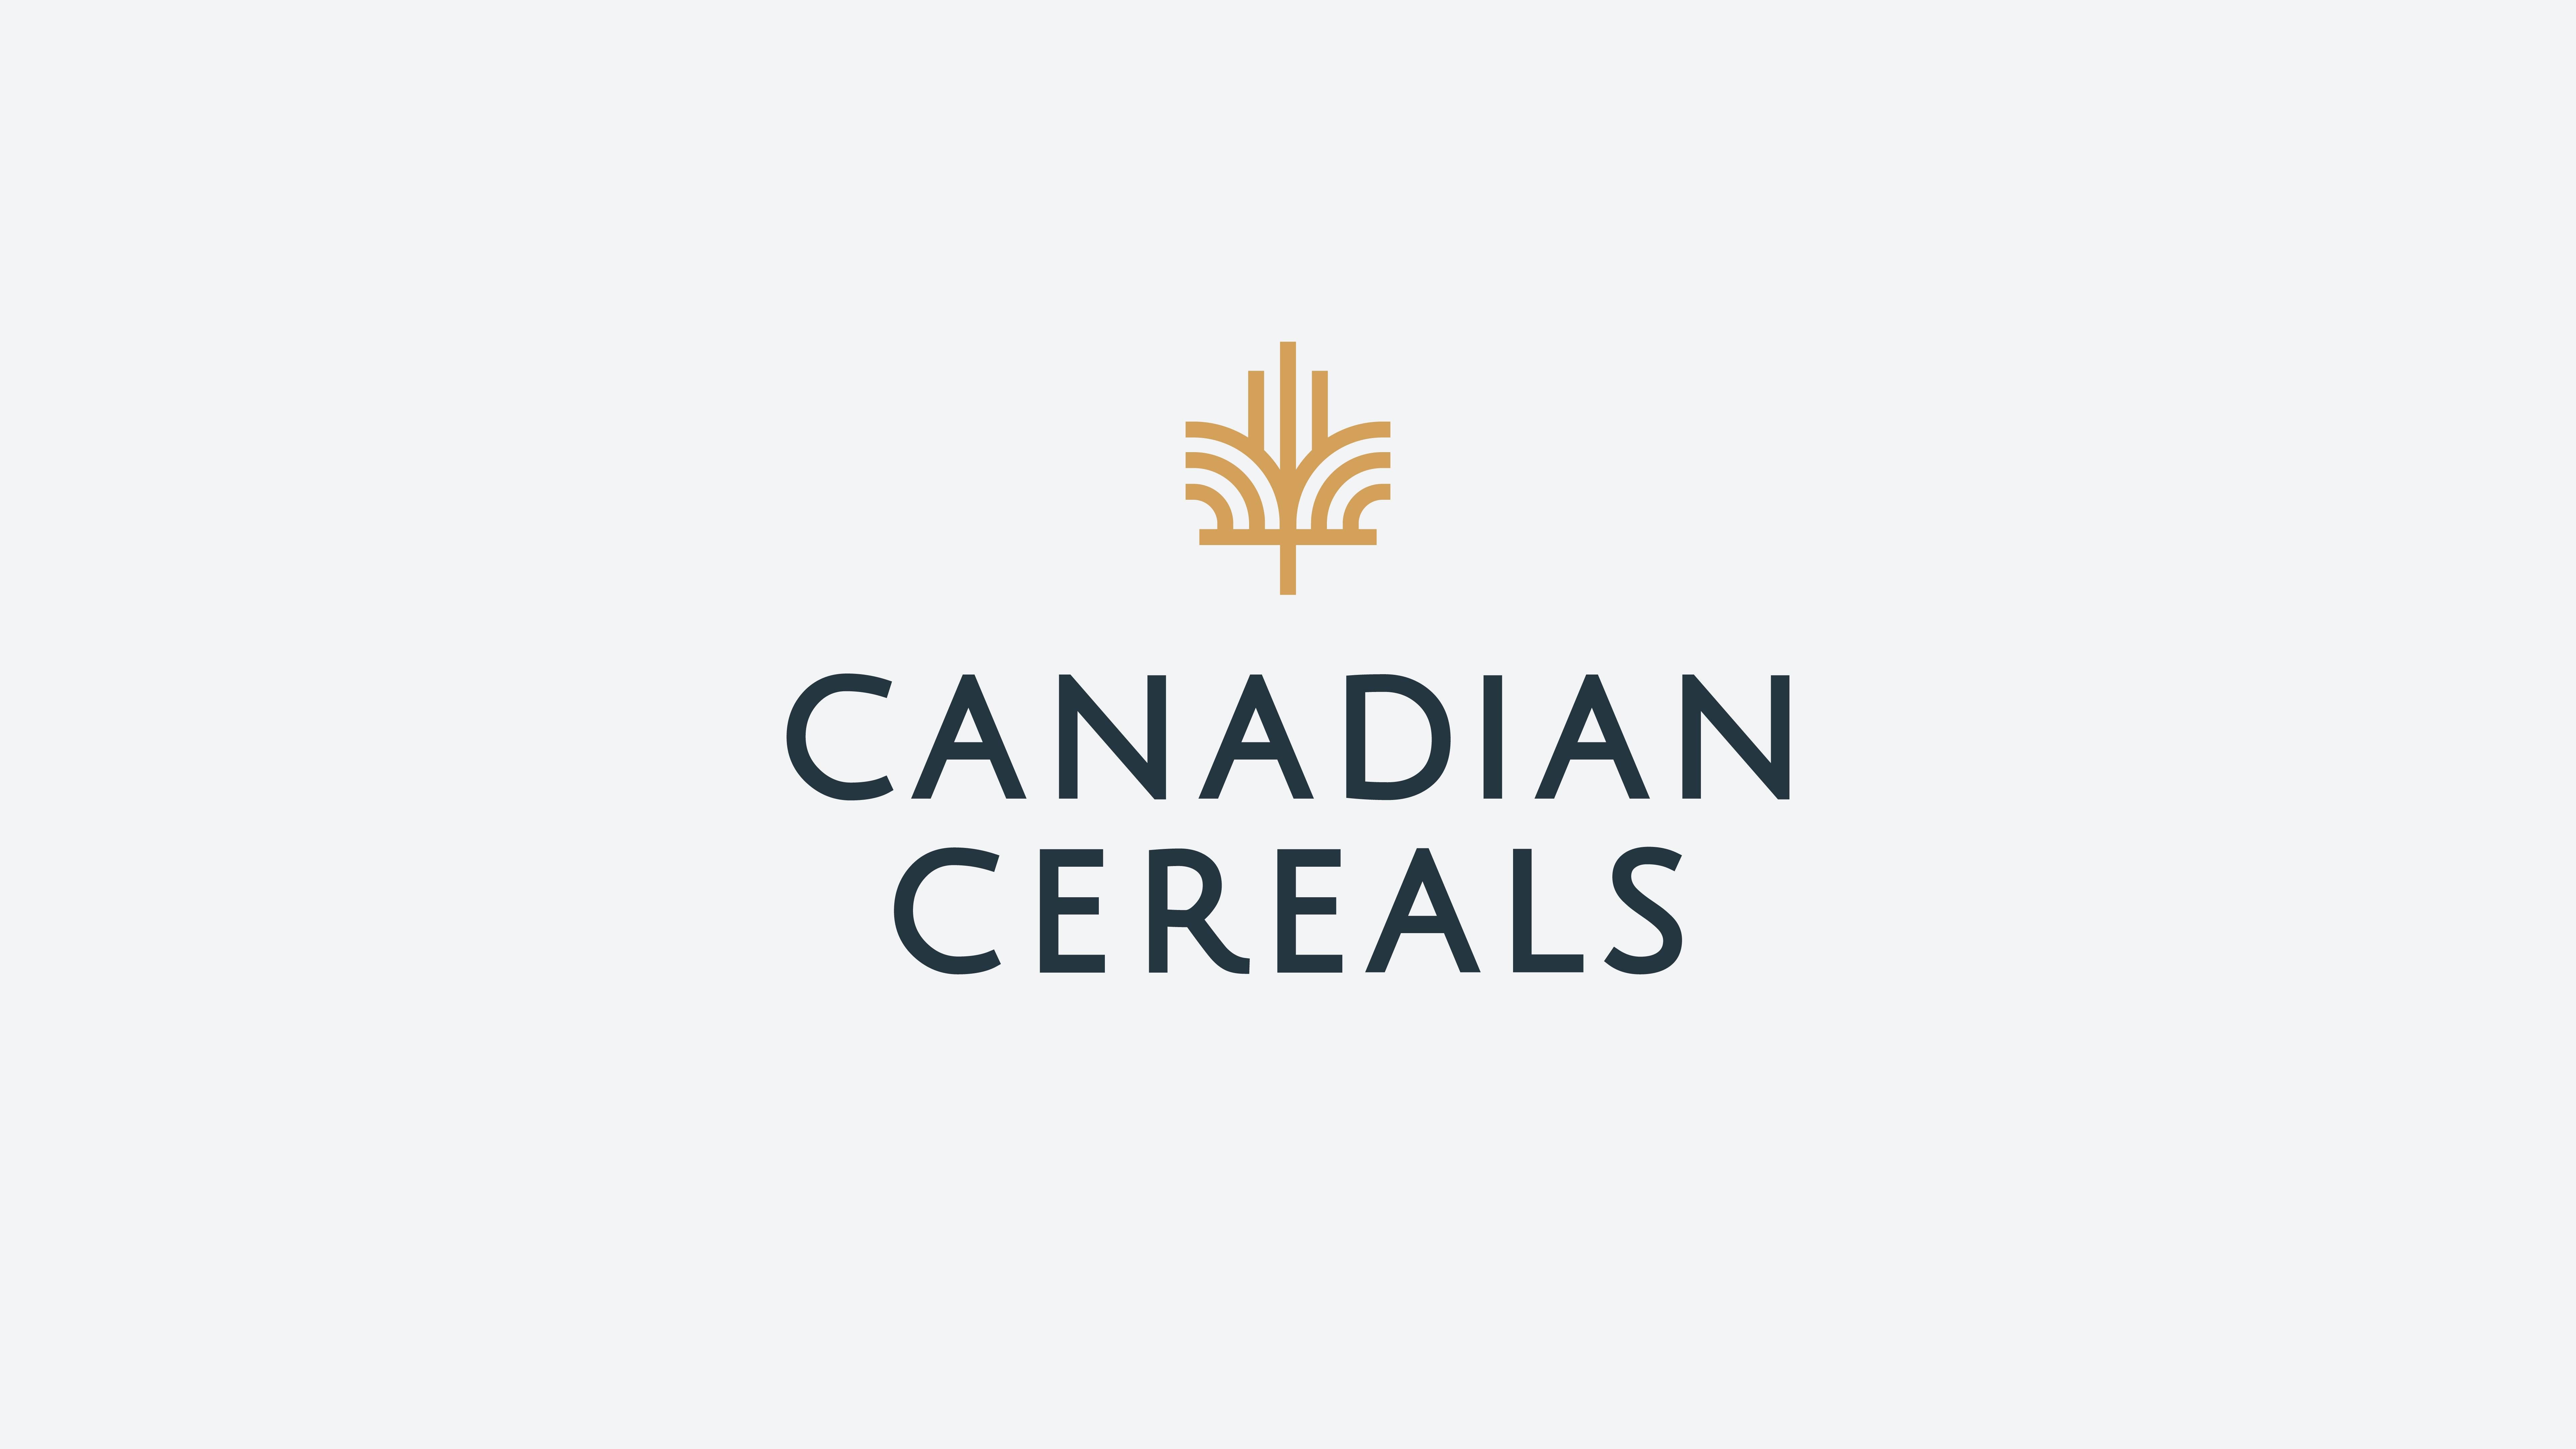 Cereals Canada New Crop Reimagined